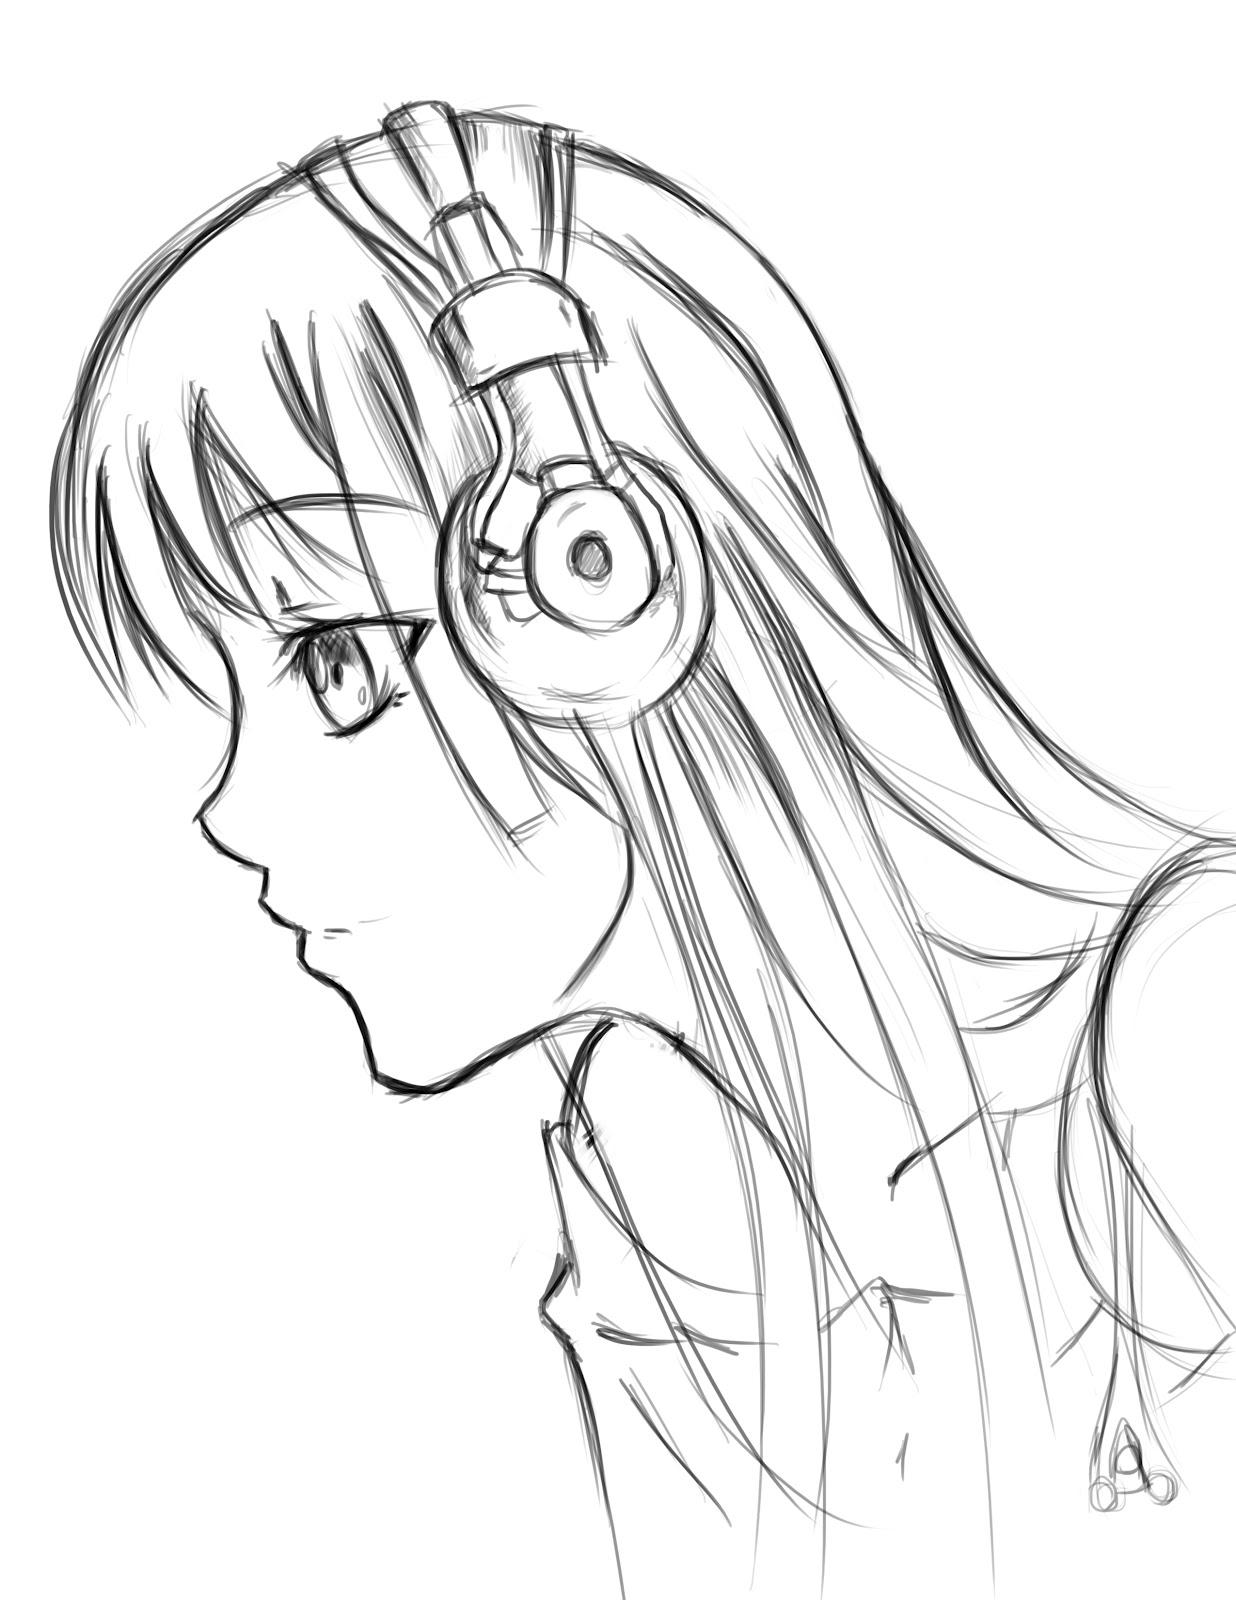 Drawn profile side view Cartoon Cartoon Anime Side Face